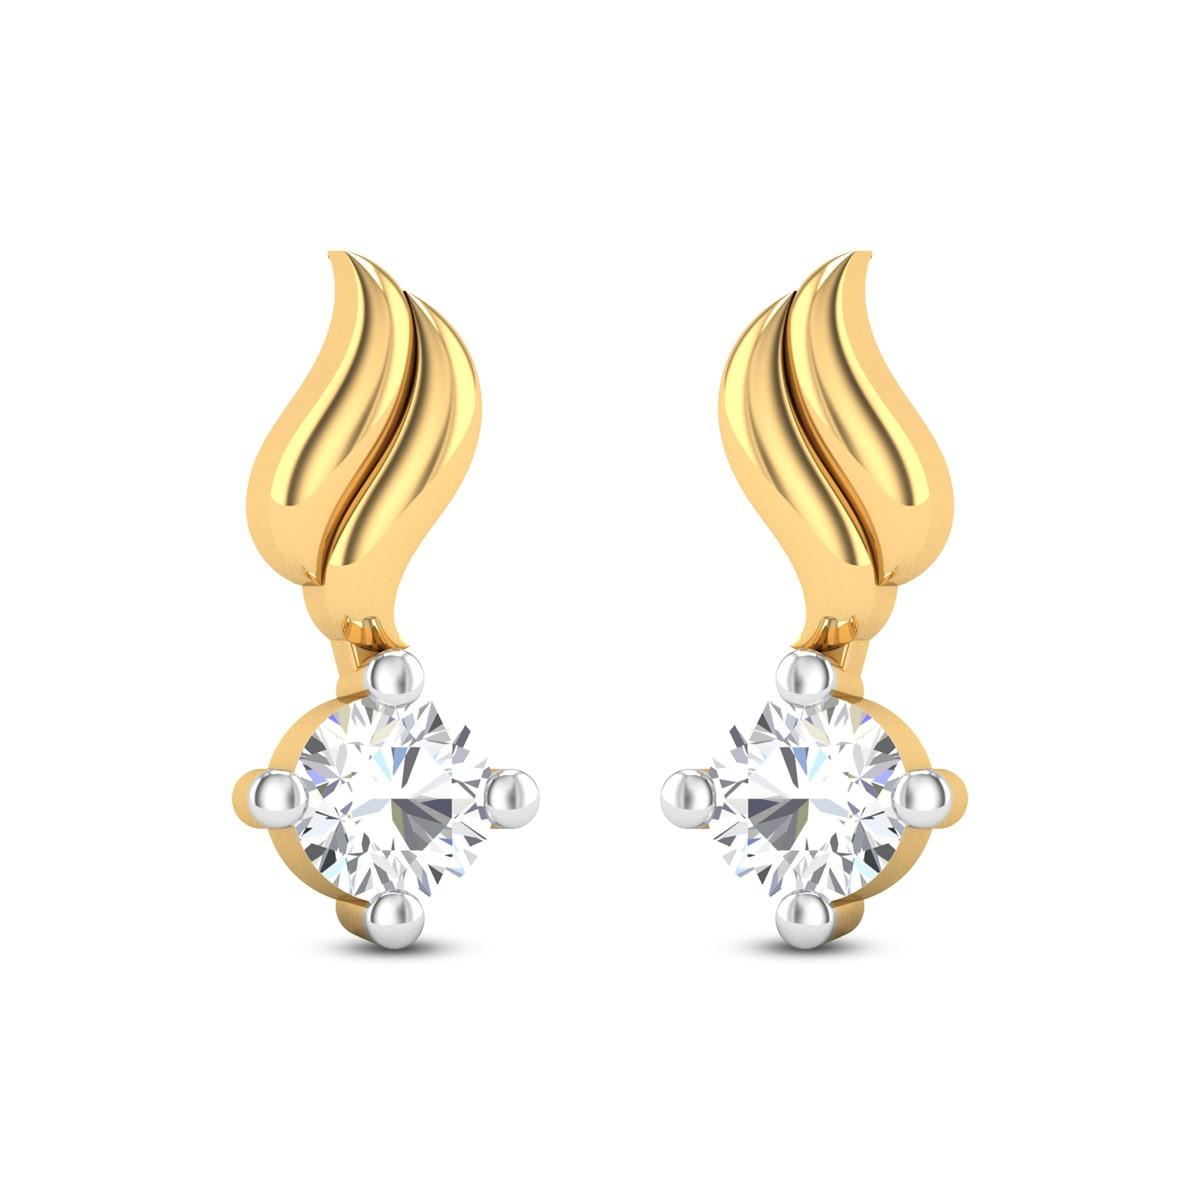 Emma Diamond Earrings